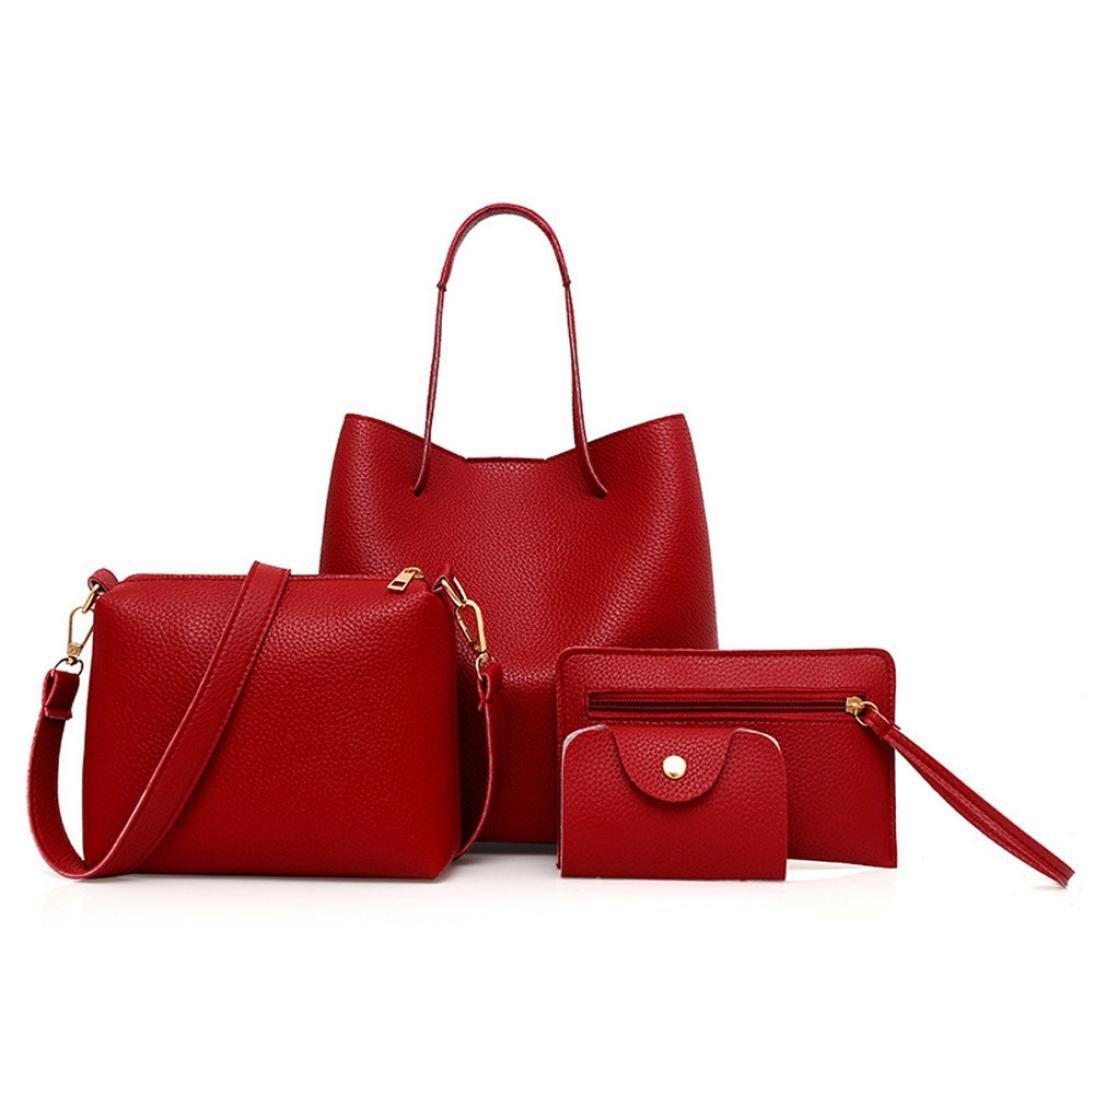 IEason bag, 4Pcs Women Pattern Leather Handbag+Crossbody Bag+Messenger Bag+Card Package (Red) by IEason-Bag (Image #2)